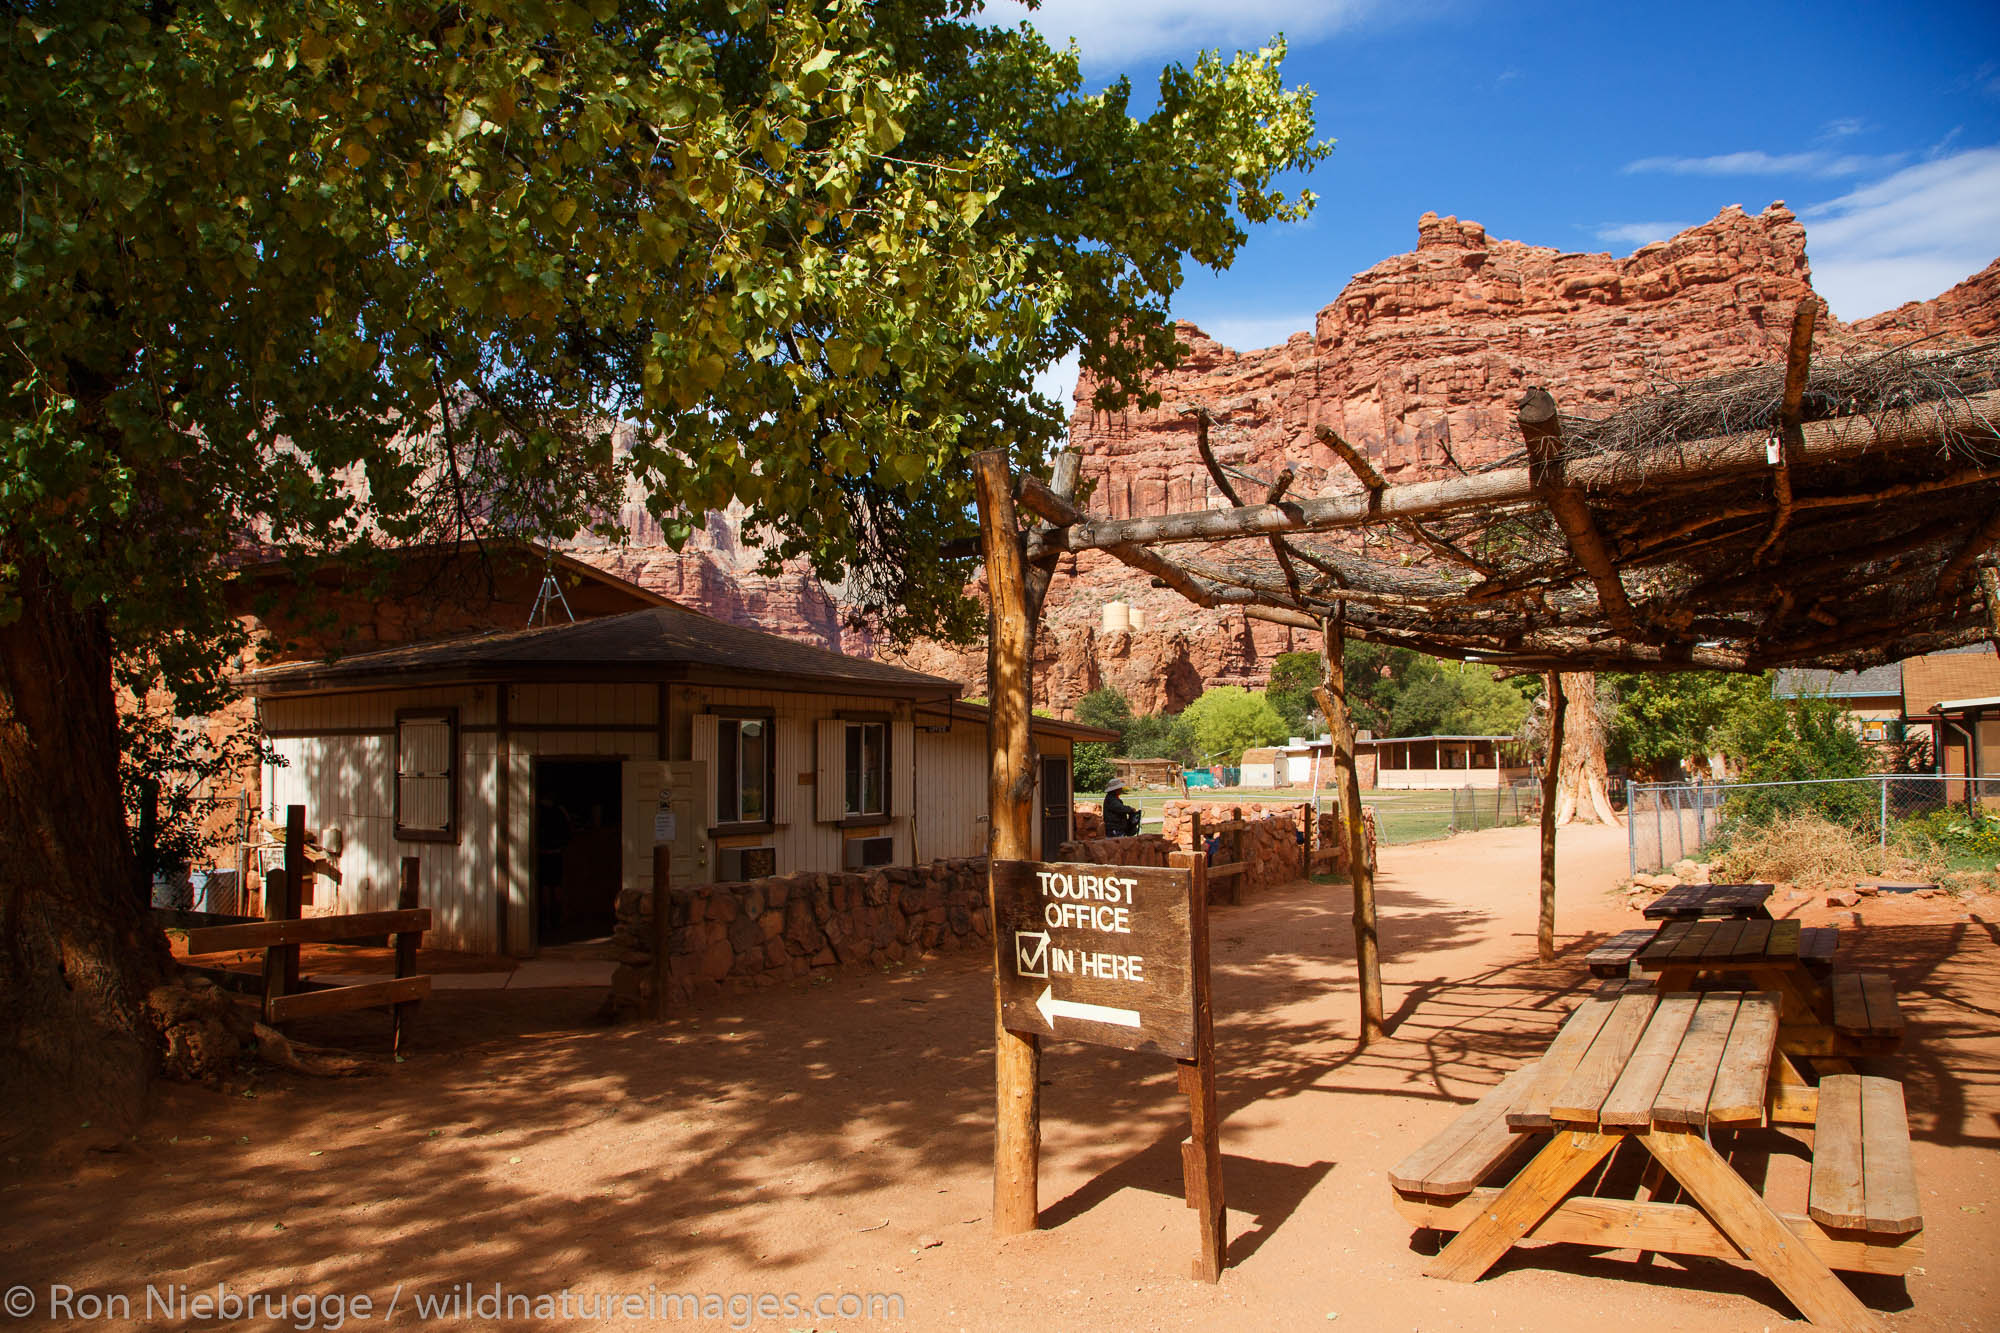 Village of Supai near Havasu Falls, Havasupai Indian Reservation, Grand Canyon, Arizona.